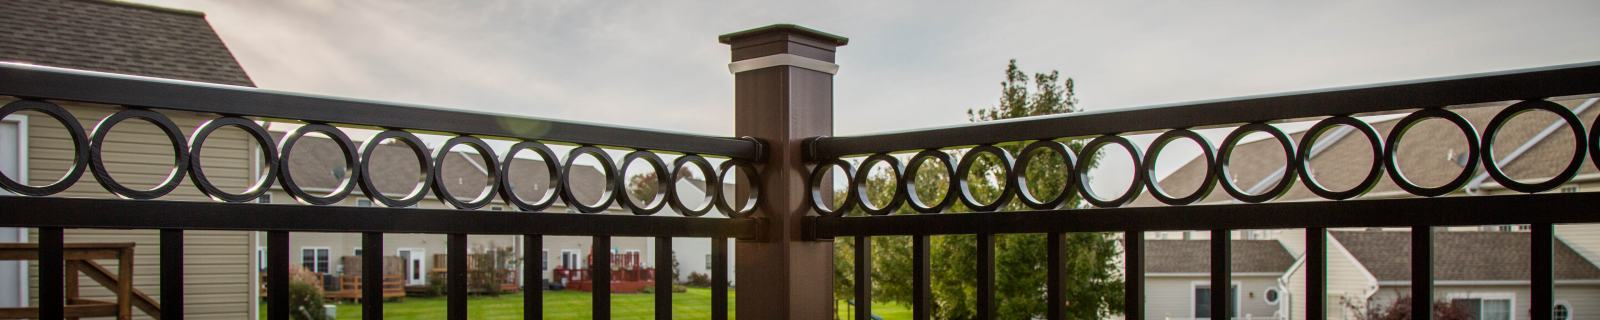 detail of corner column and vinyl railings